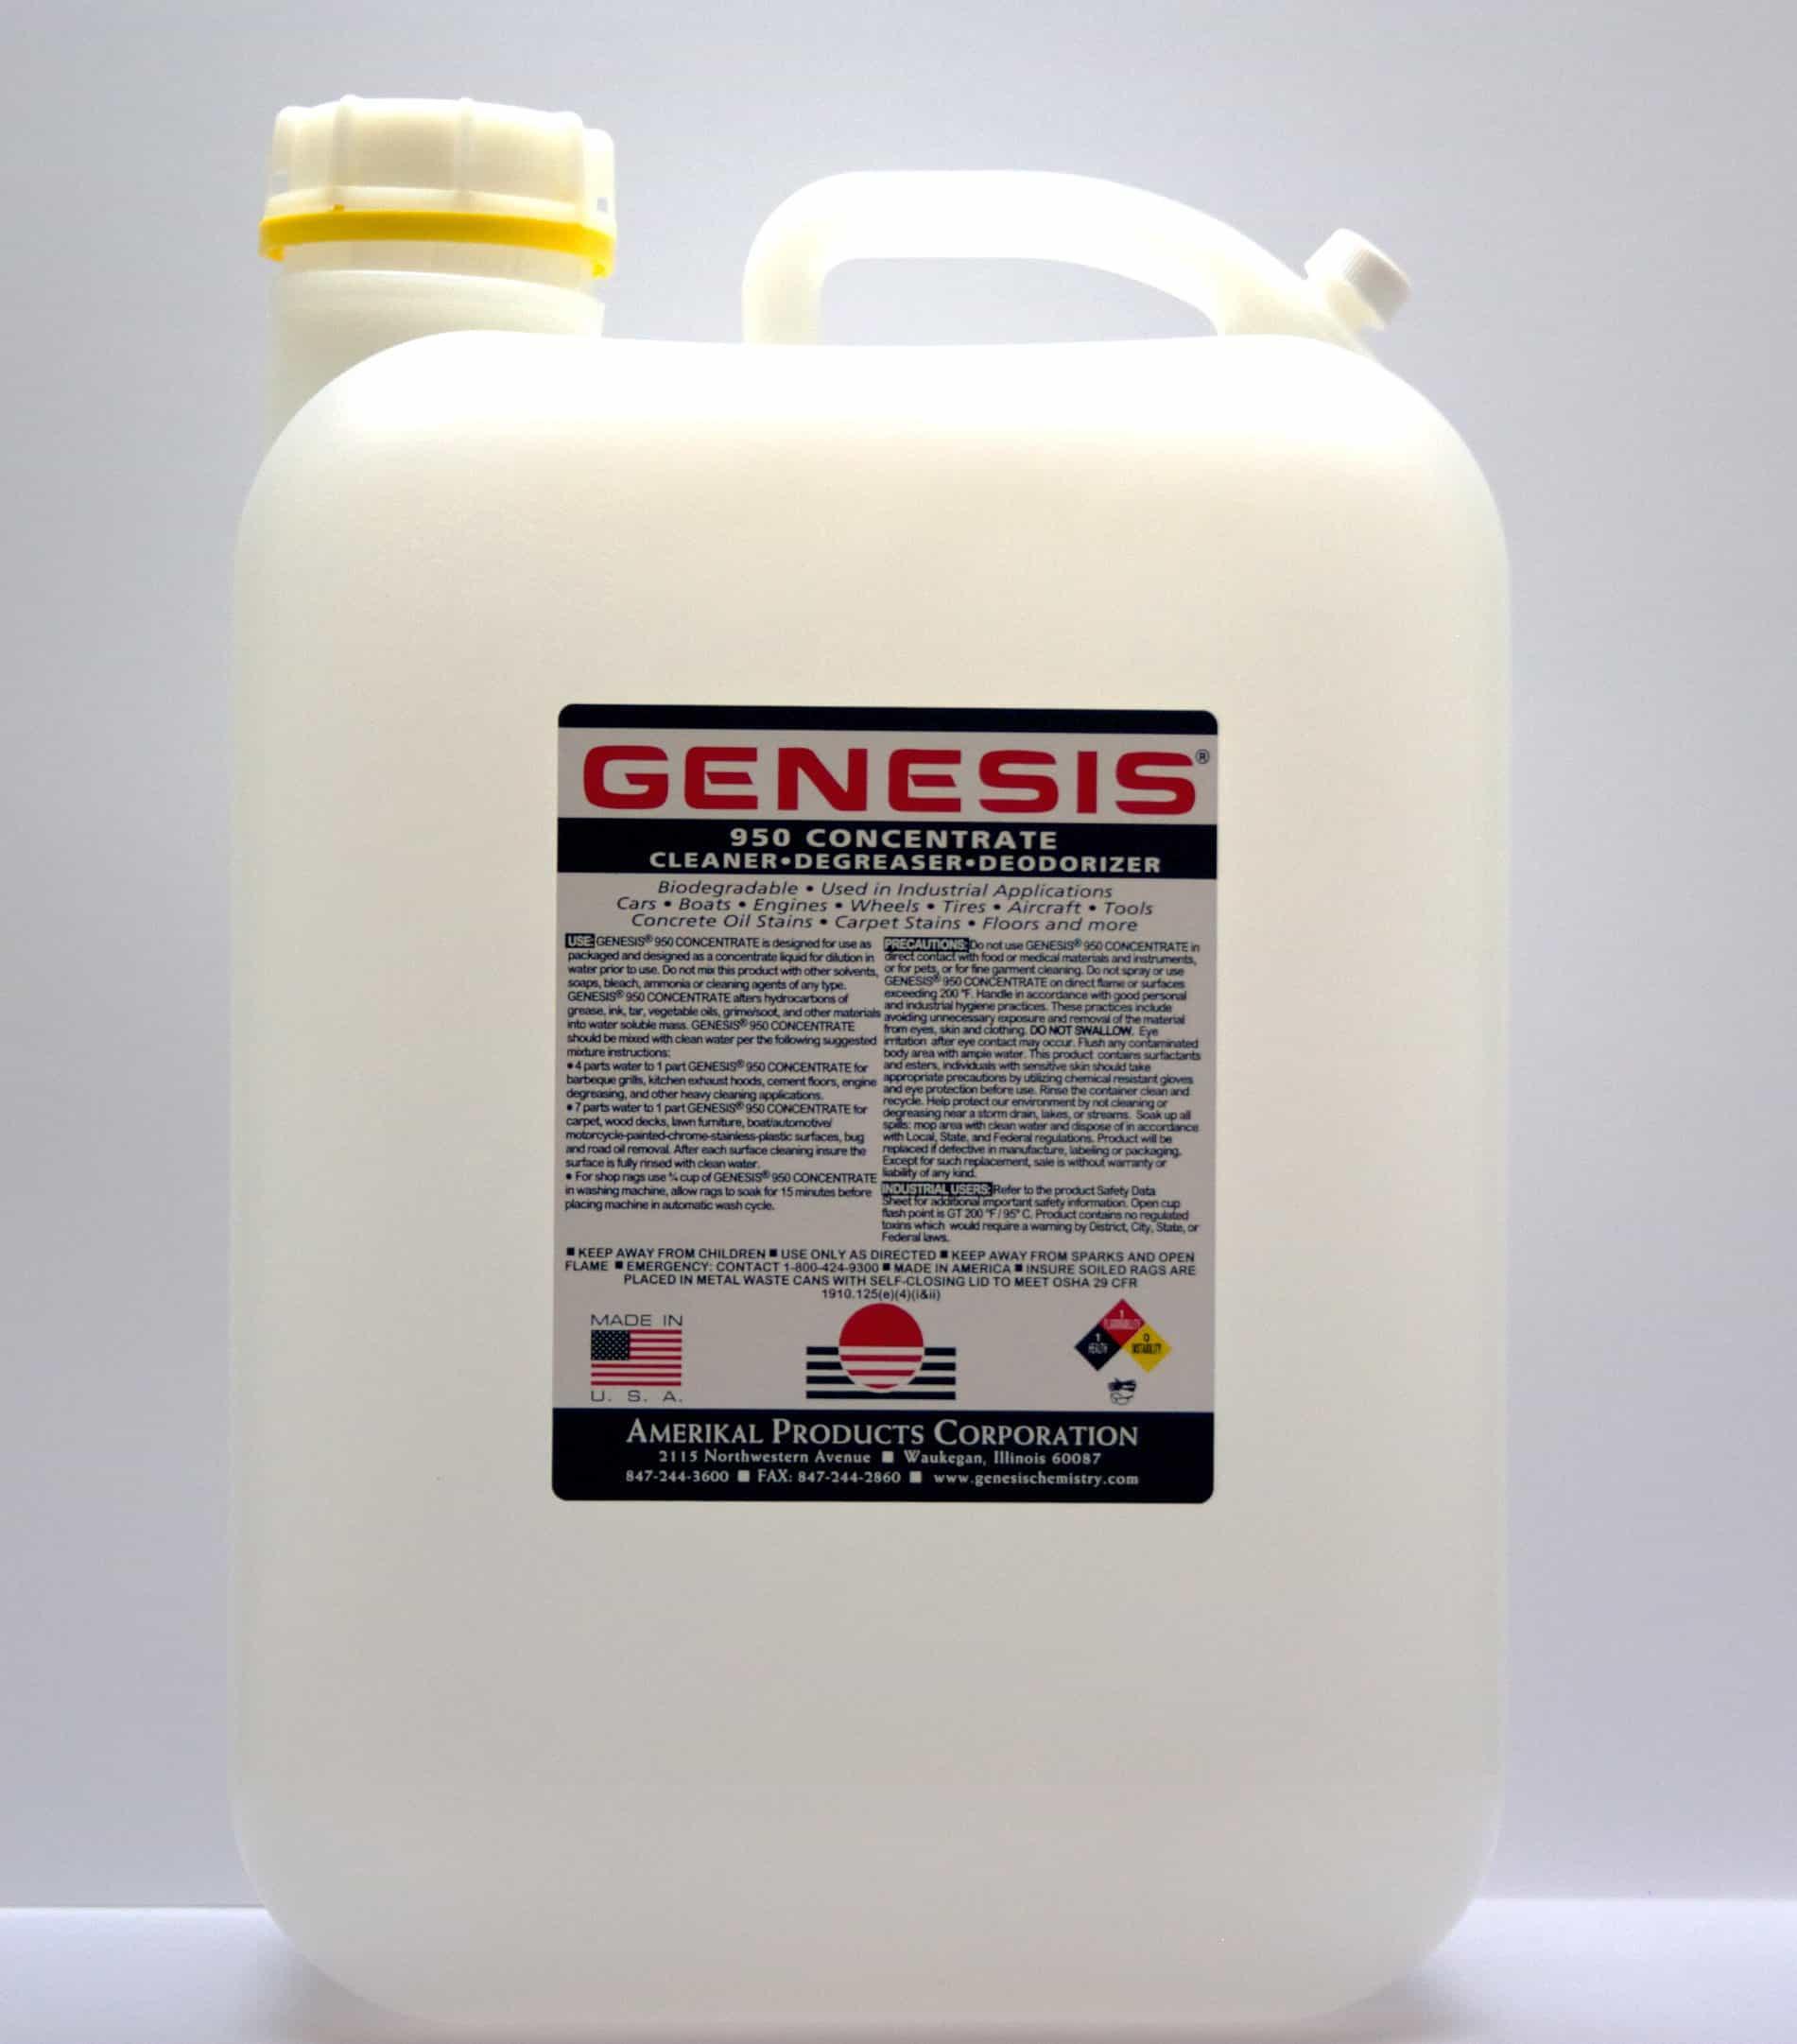 Genesis 950 Amerikal Products Corporation